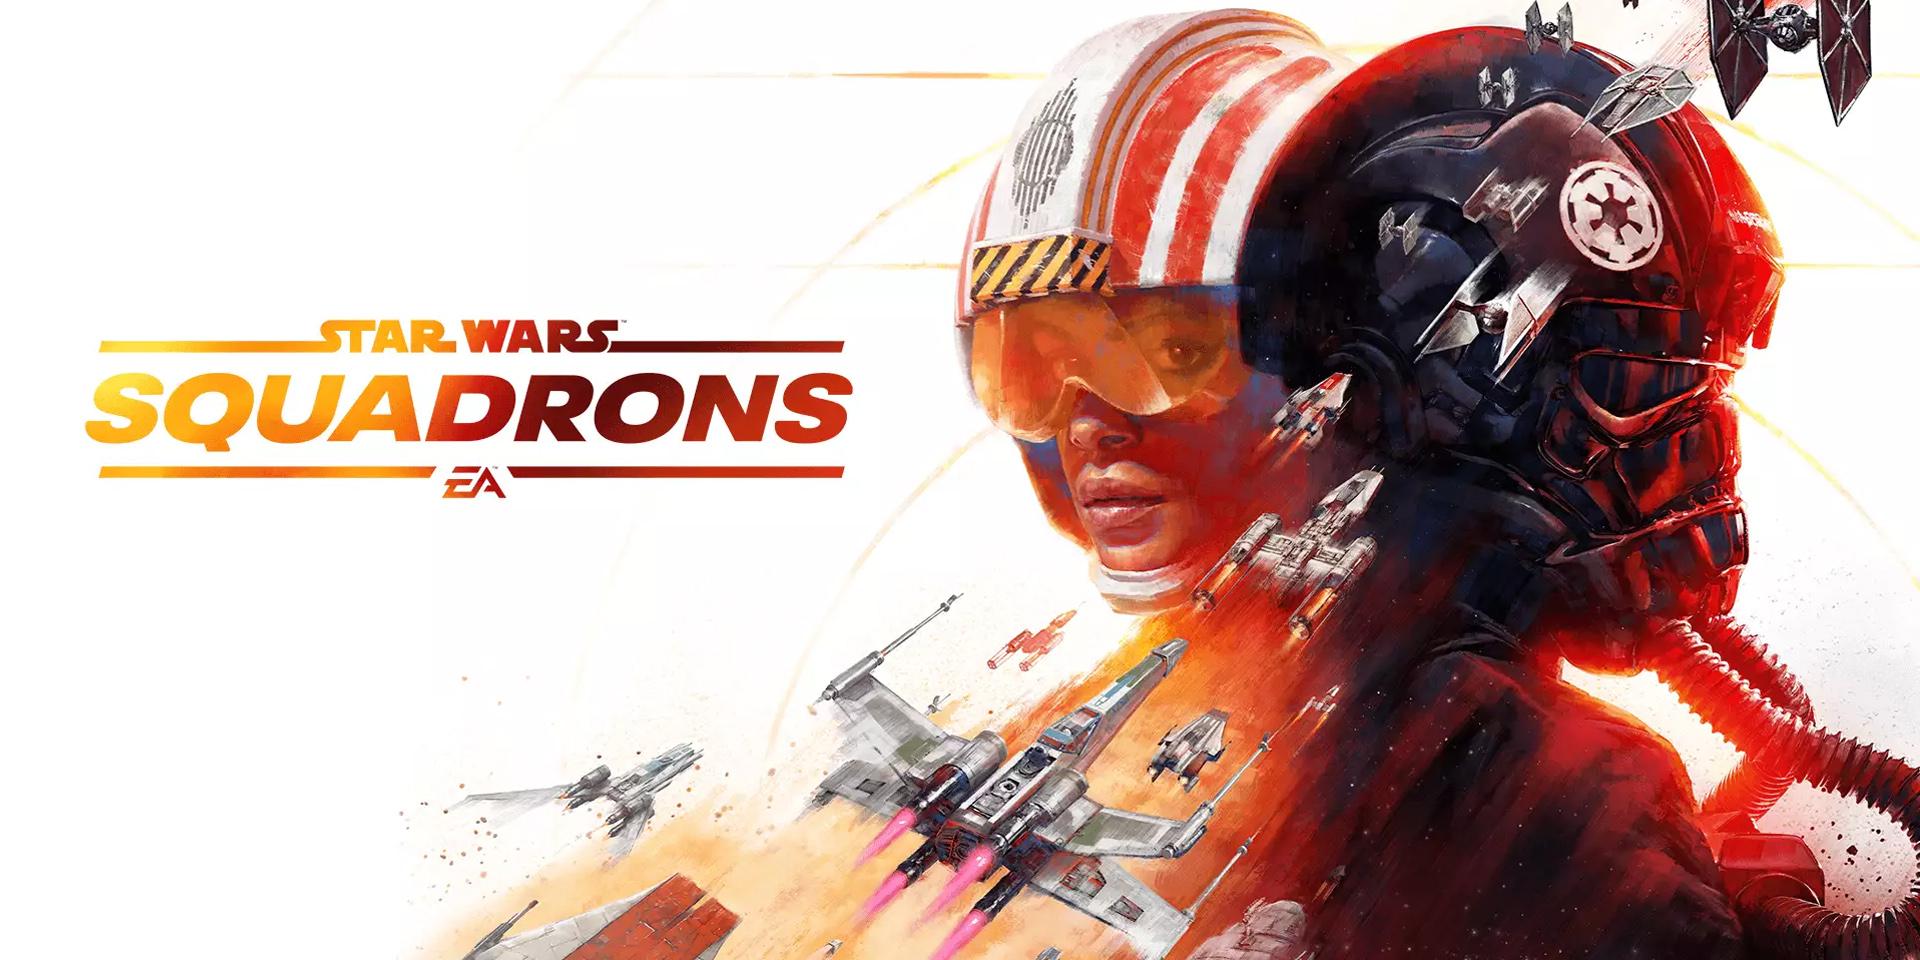 MMO-индустрия: Star Wars: Squadrons как пример мультиплеерного аттракциона